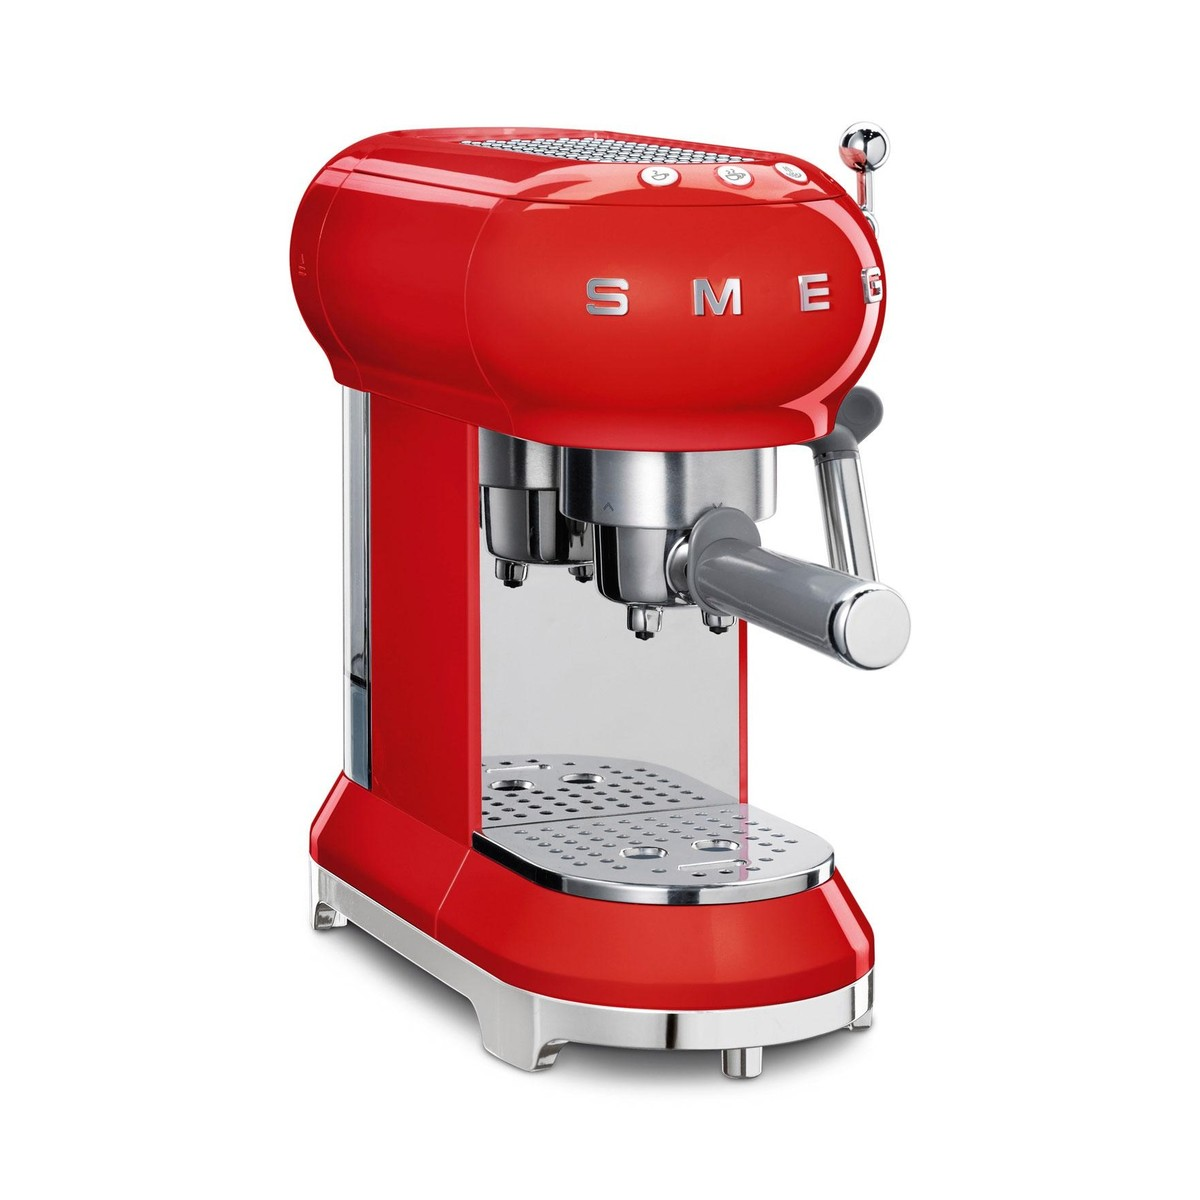 Kaffeemaschine Espresso M 246 Bel Design Idee F 252 R Sie Gt Gt Latofu Com